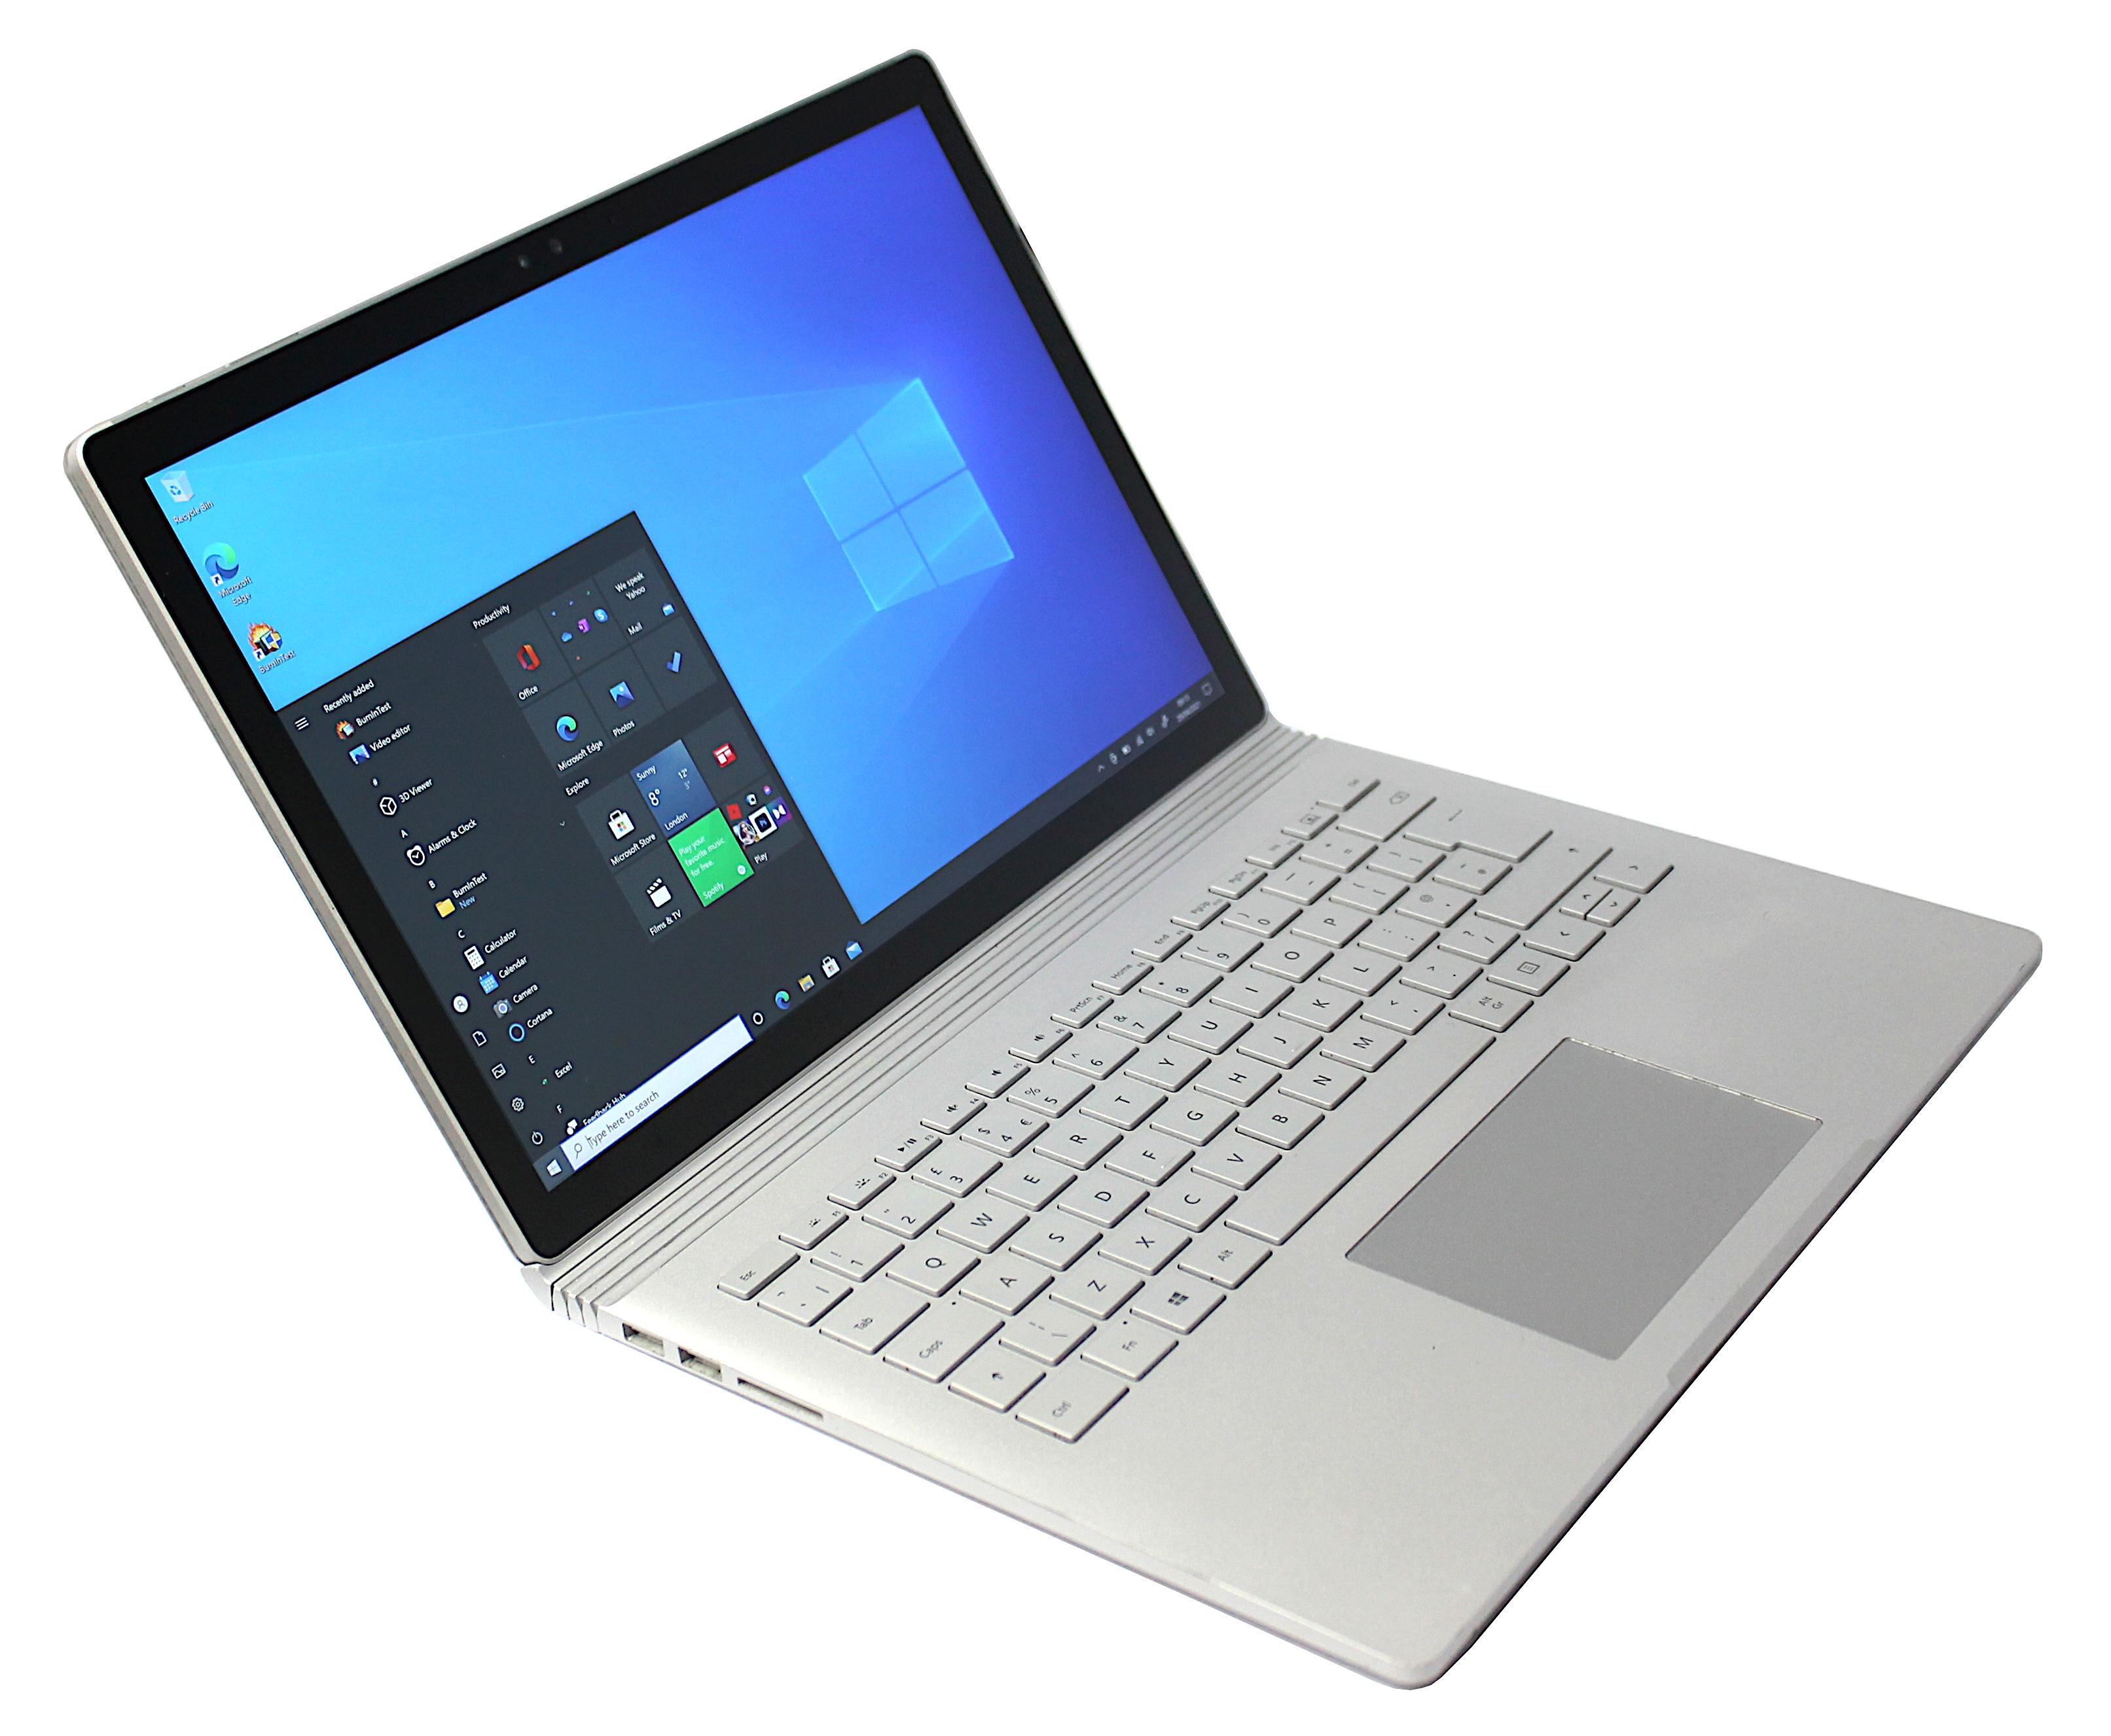 Microsoft Surface Book -1703 & 1705 i5-6300U 8GB RAM 256GB SSD Windows 10 Pro